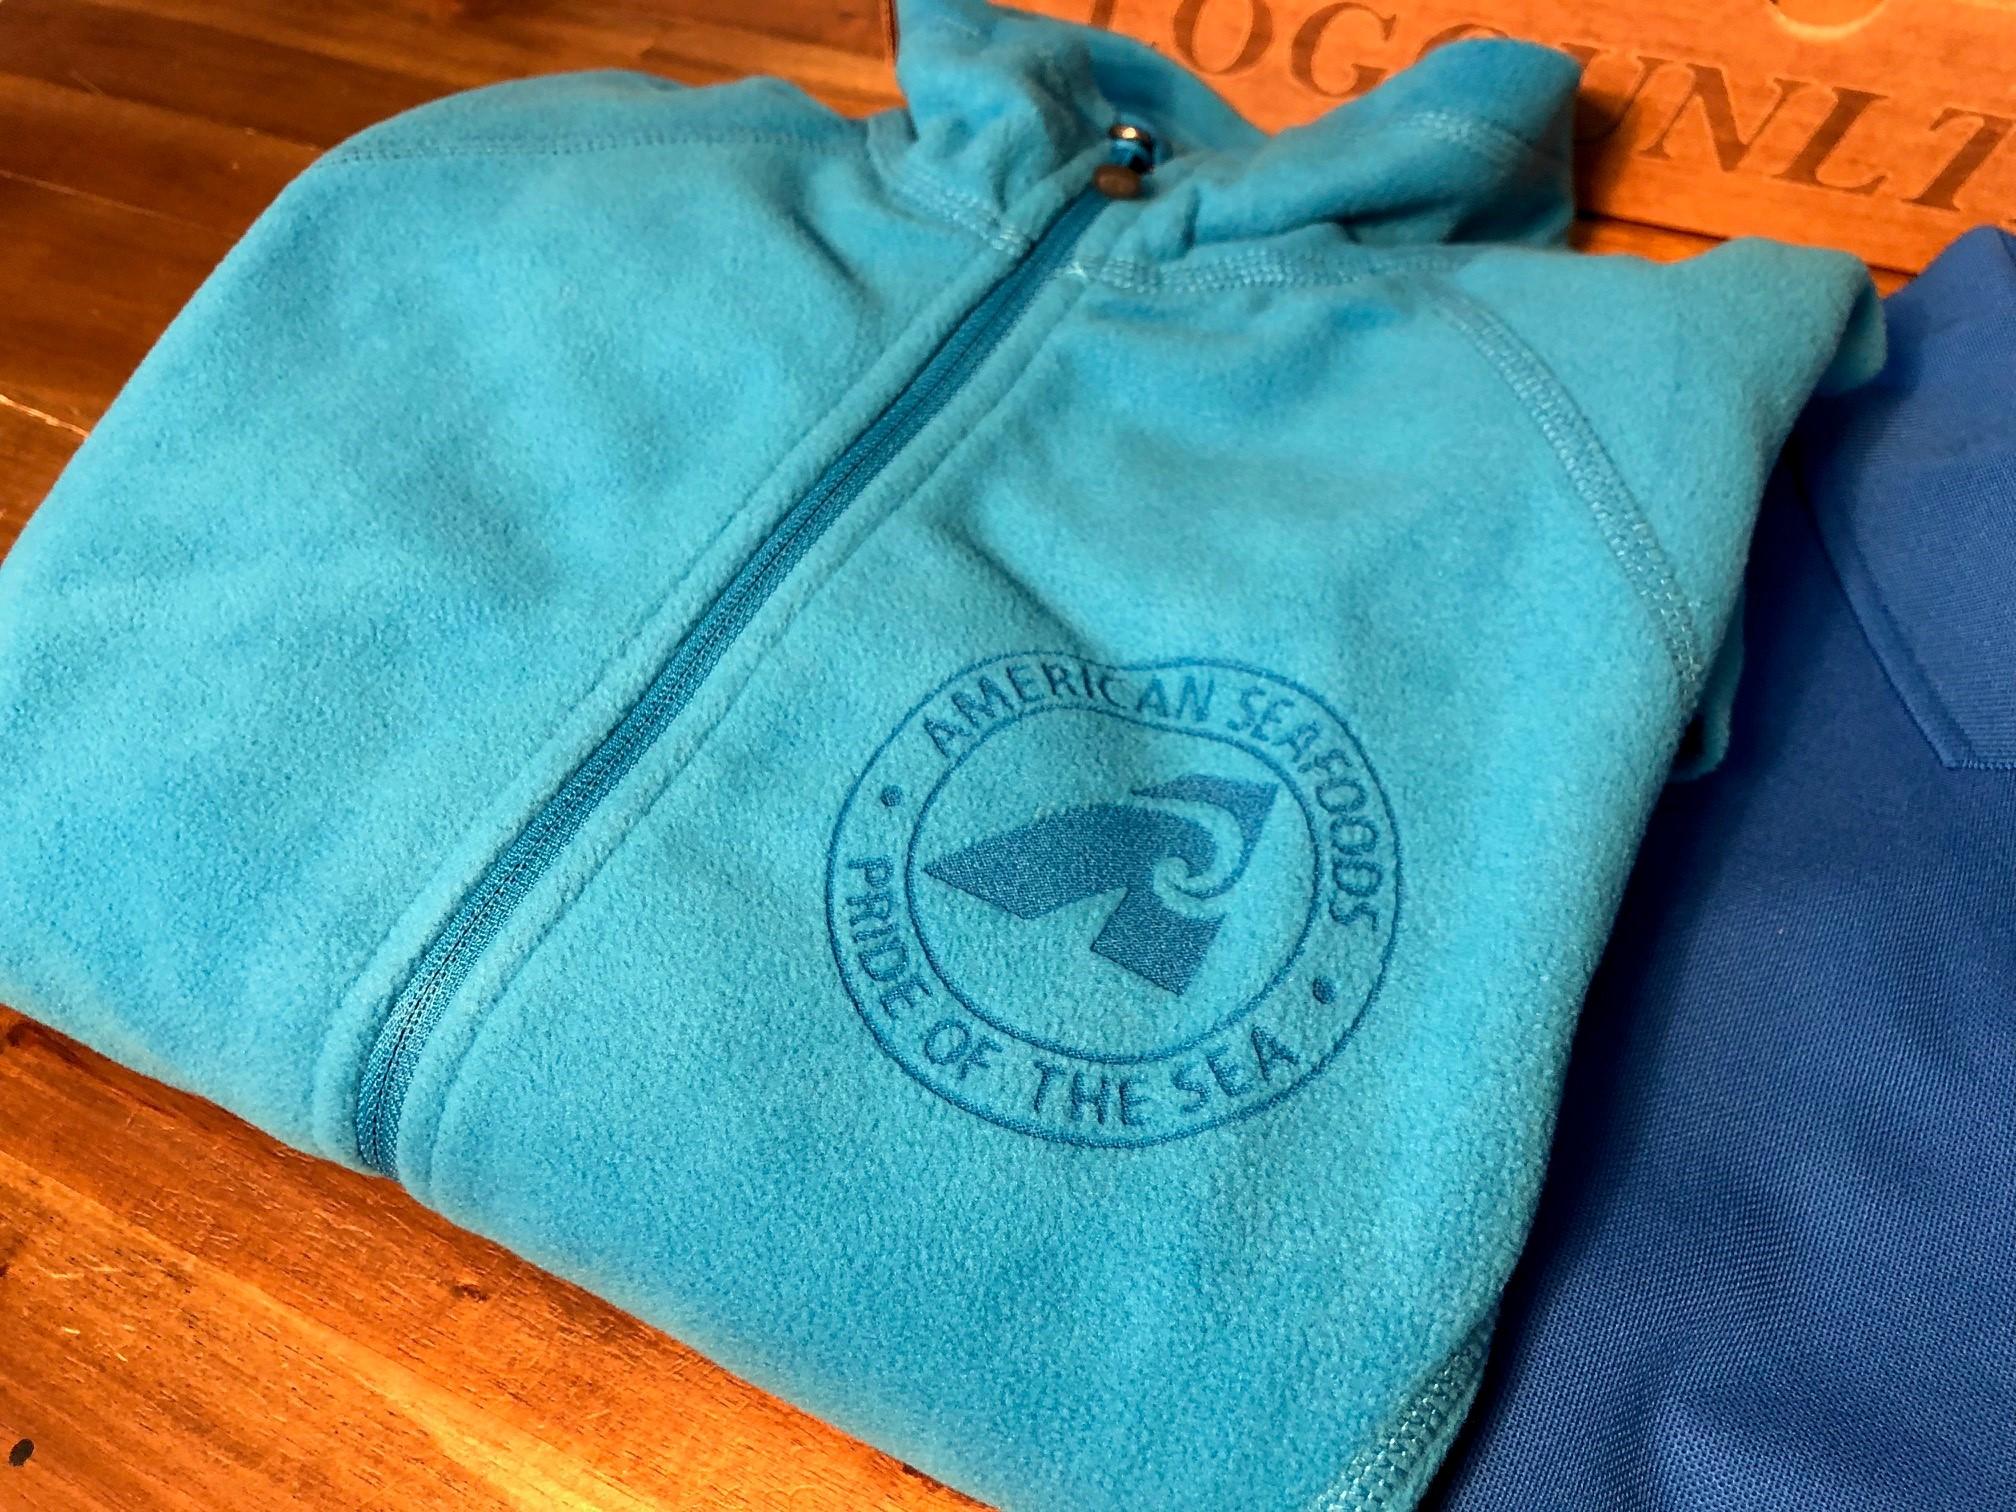 logounltd_laser_etching_embroidery_screen_printing_apparel_uniform_custom_tshirts_dye_sublimation_kirkland_bellevue_seattle_redmond_branded_merchandise_promotional_products_logo_unltd_american_seafoods (3).jpg